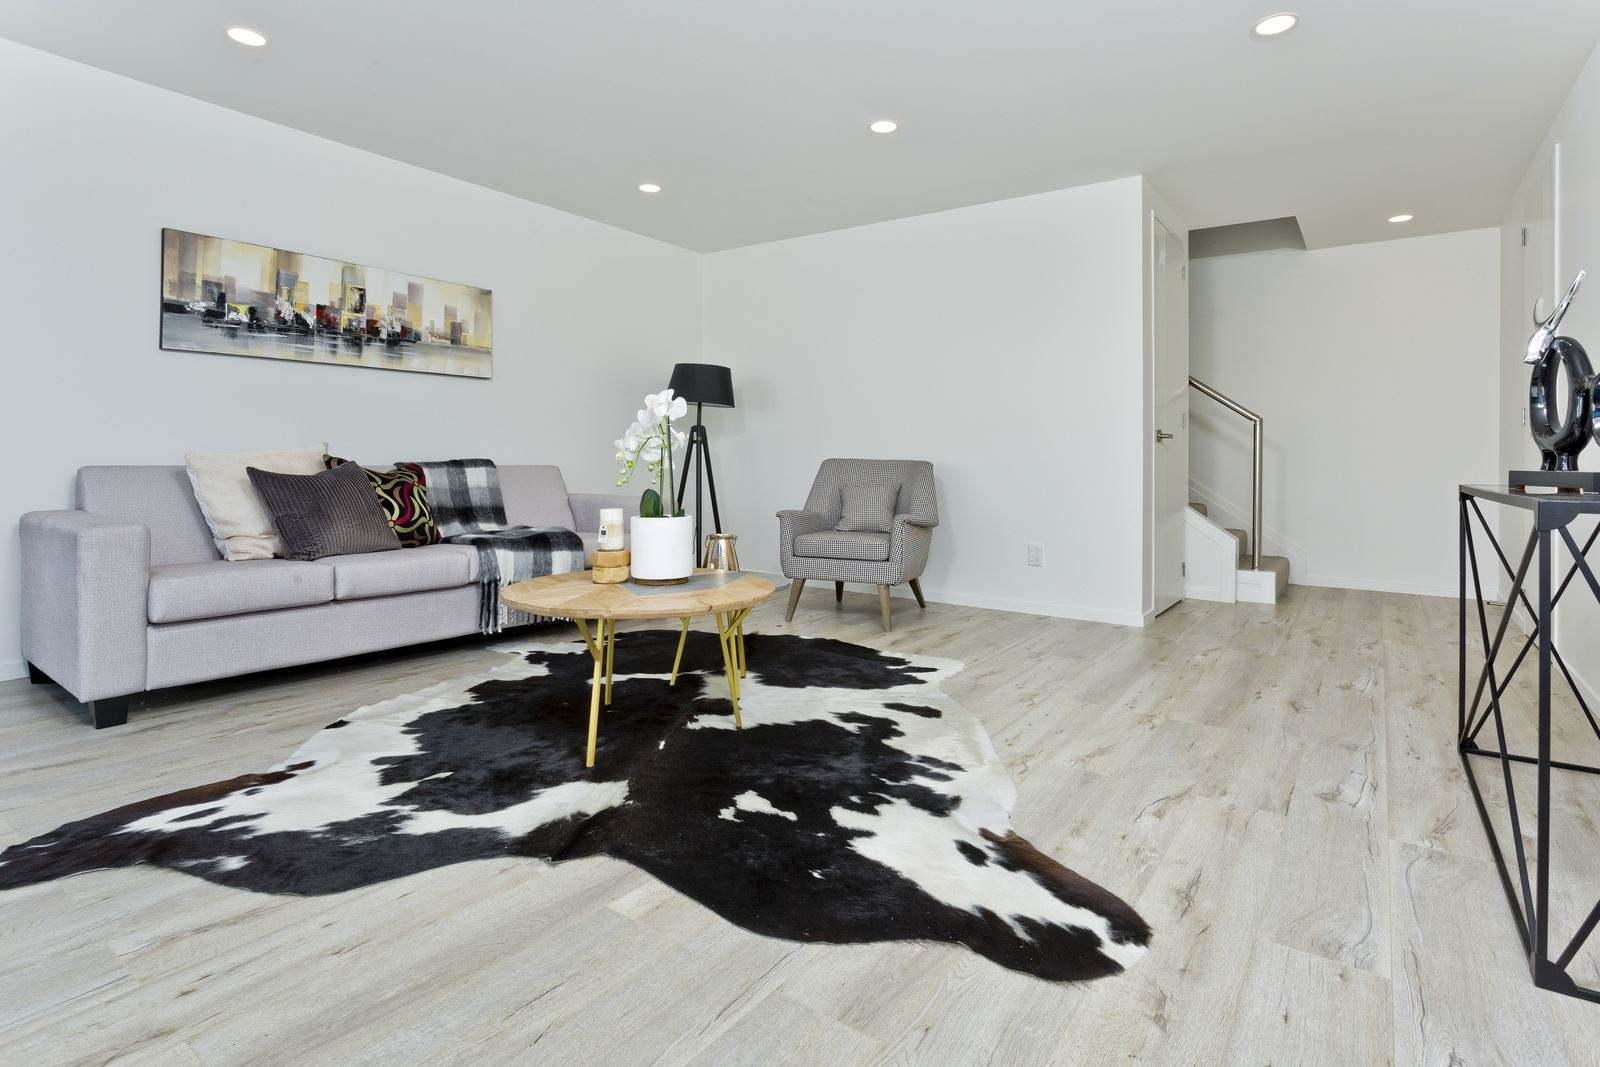 Glenfield 4房 全新现代舒居 好校为邻 10年质保 品质配设+安保系统 接受拍前出价! Grab a Brand New 4 Bedroom Bargain!